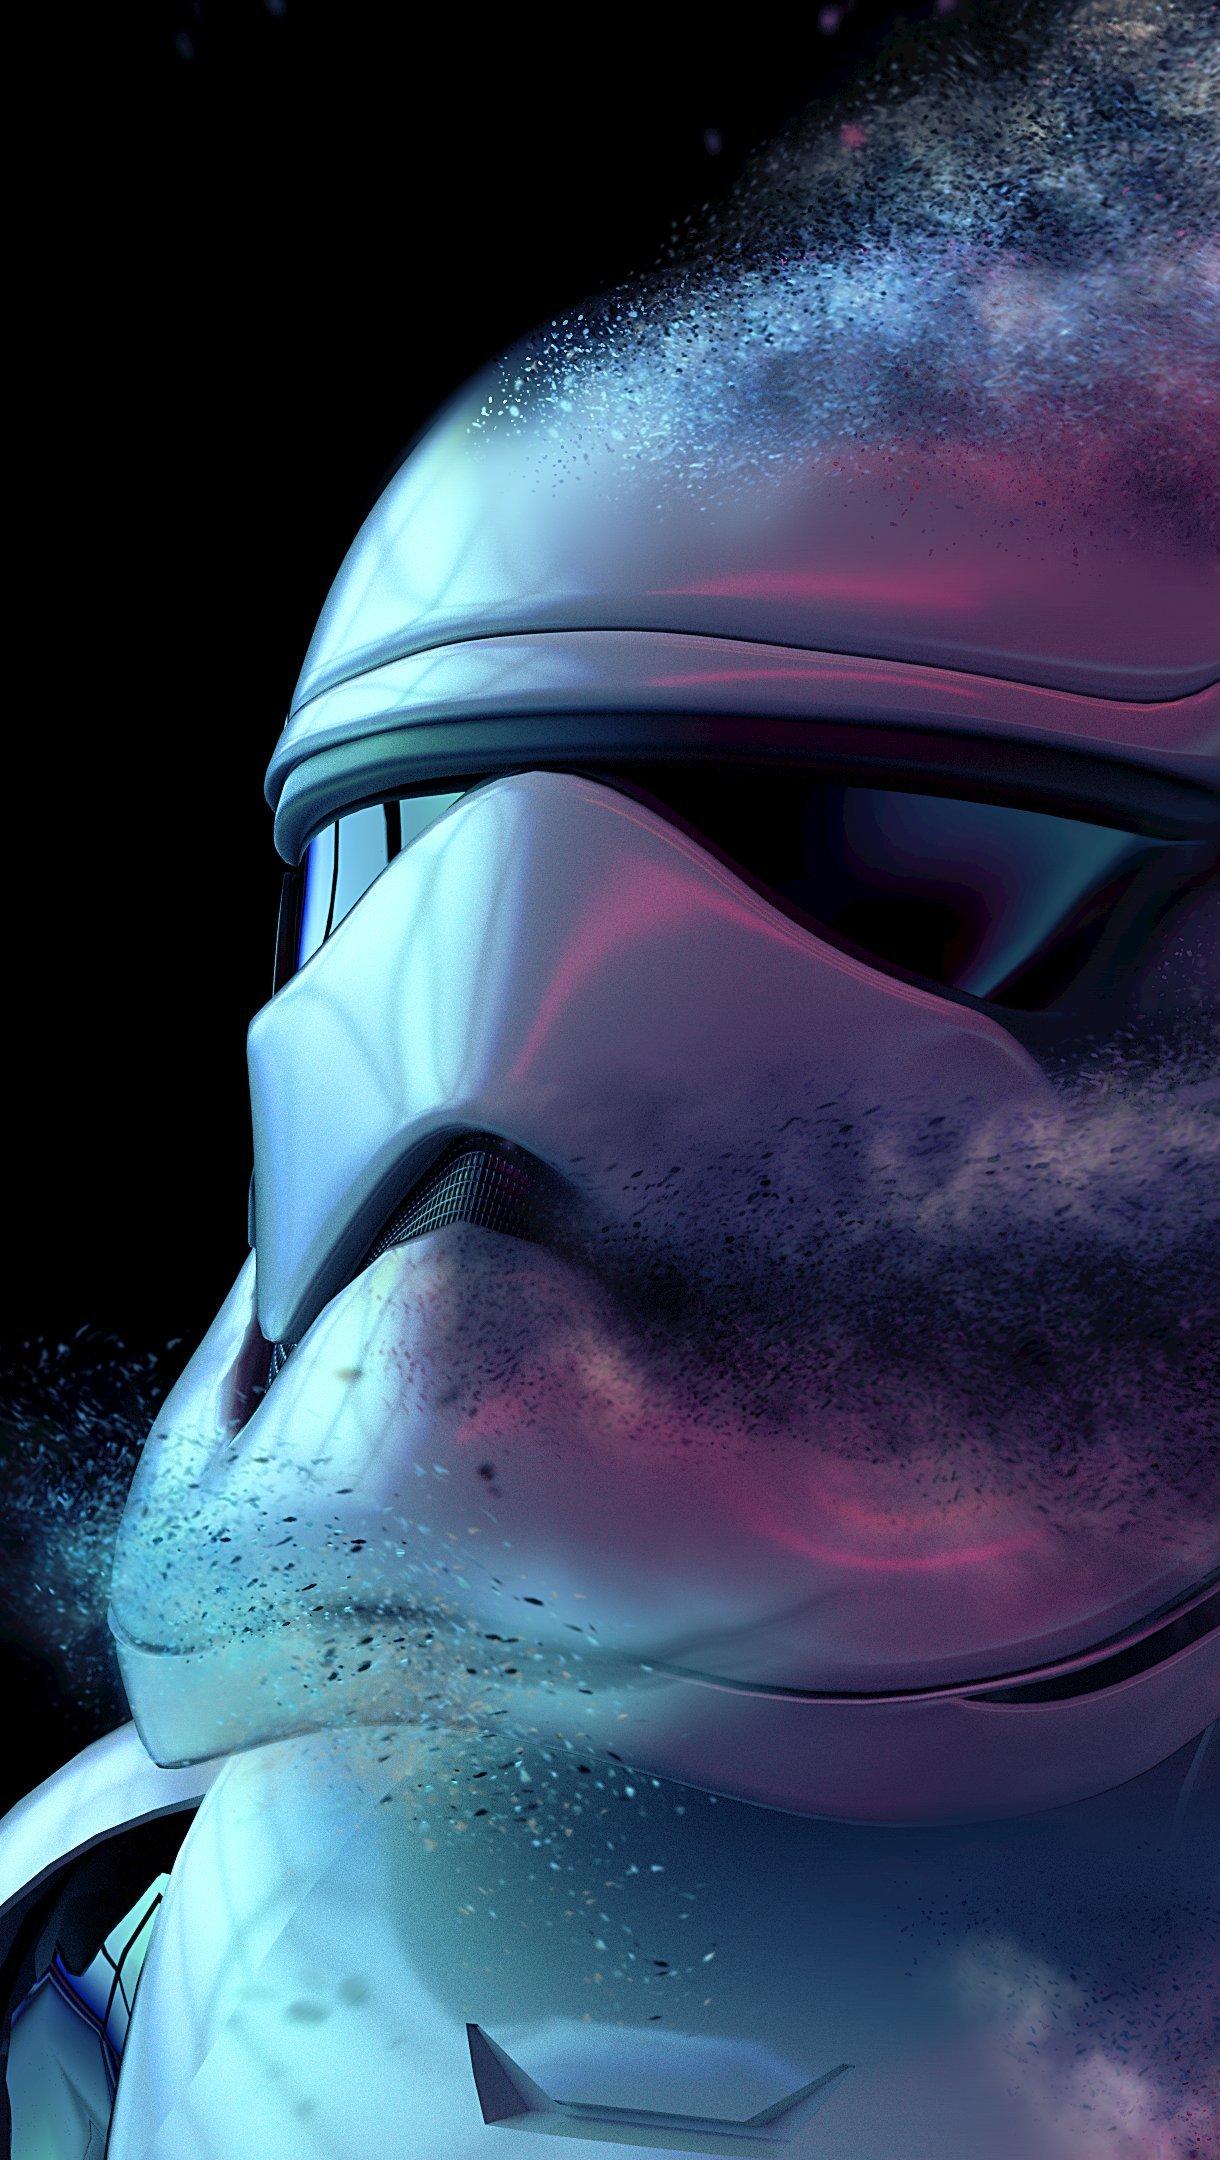 Stormtrooper Wallpaper 4k Ultra Hd Id 3643